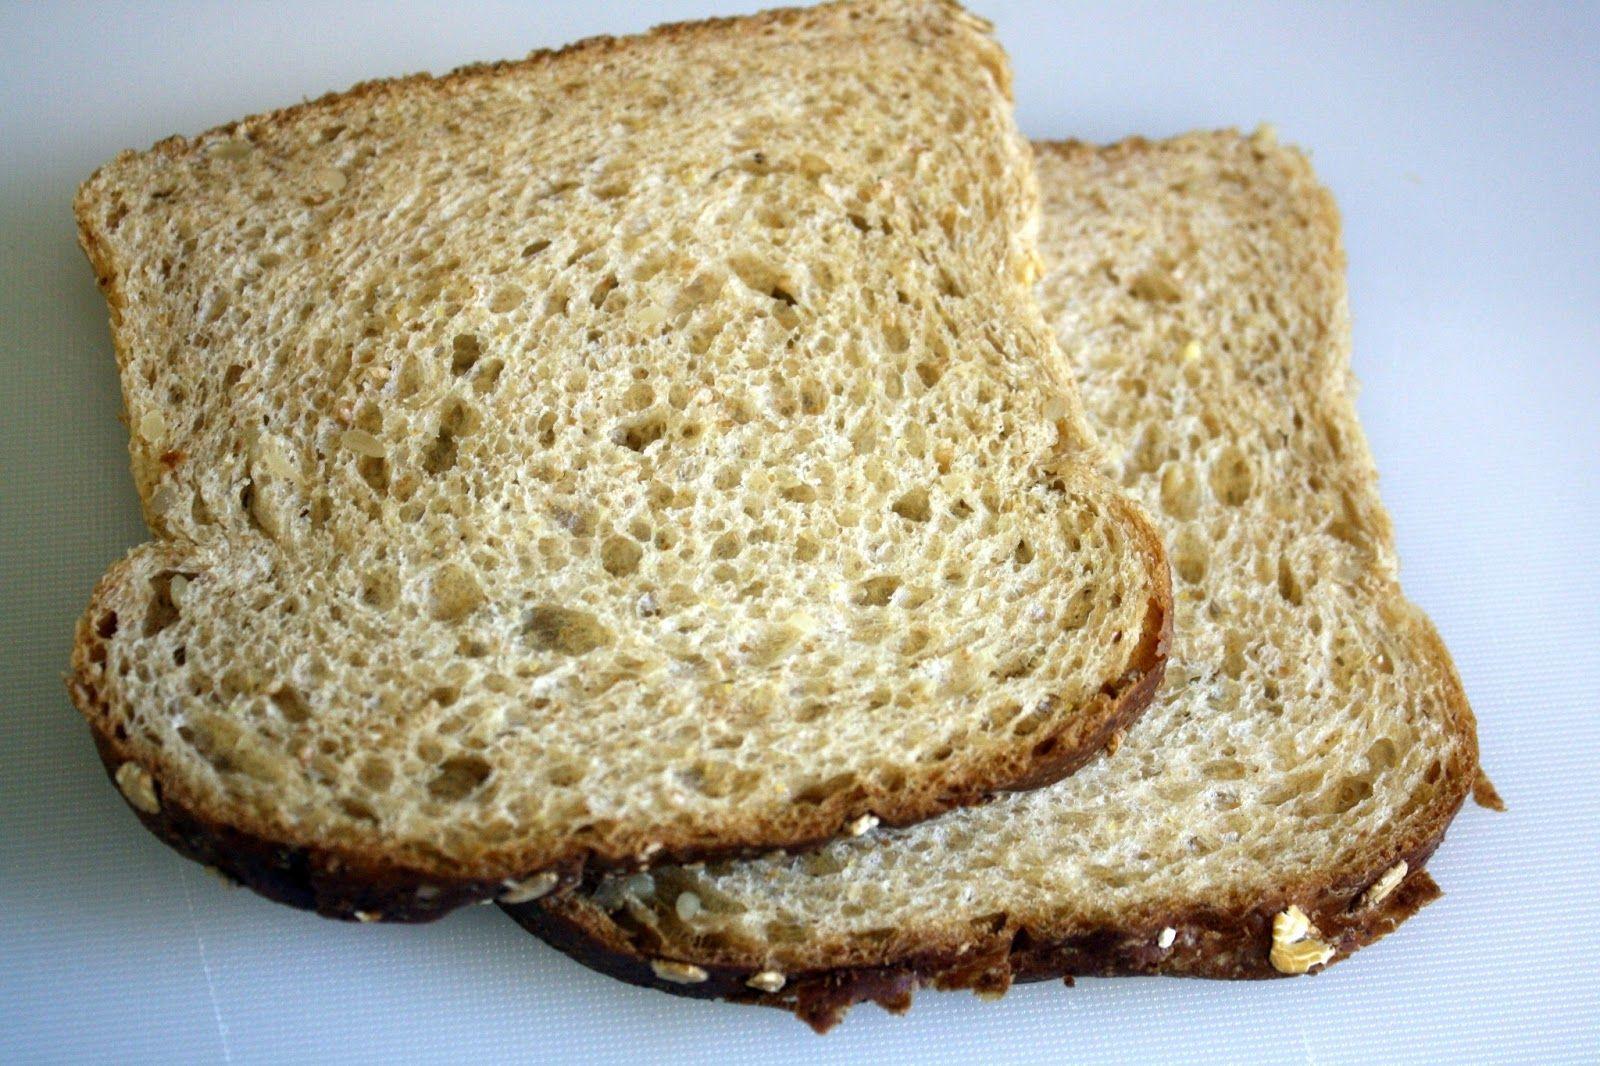 Best Whole Grain Bread  Top 10 Fat Burning Foods